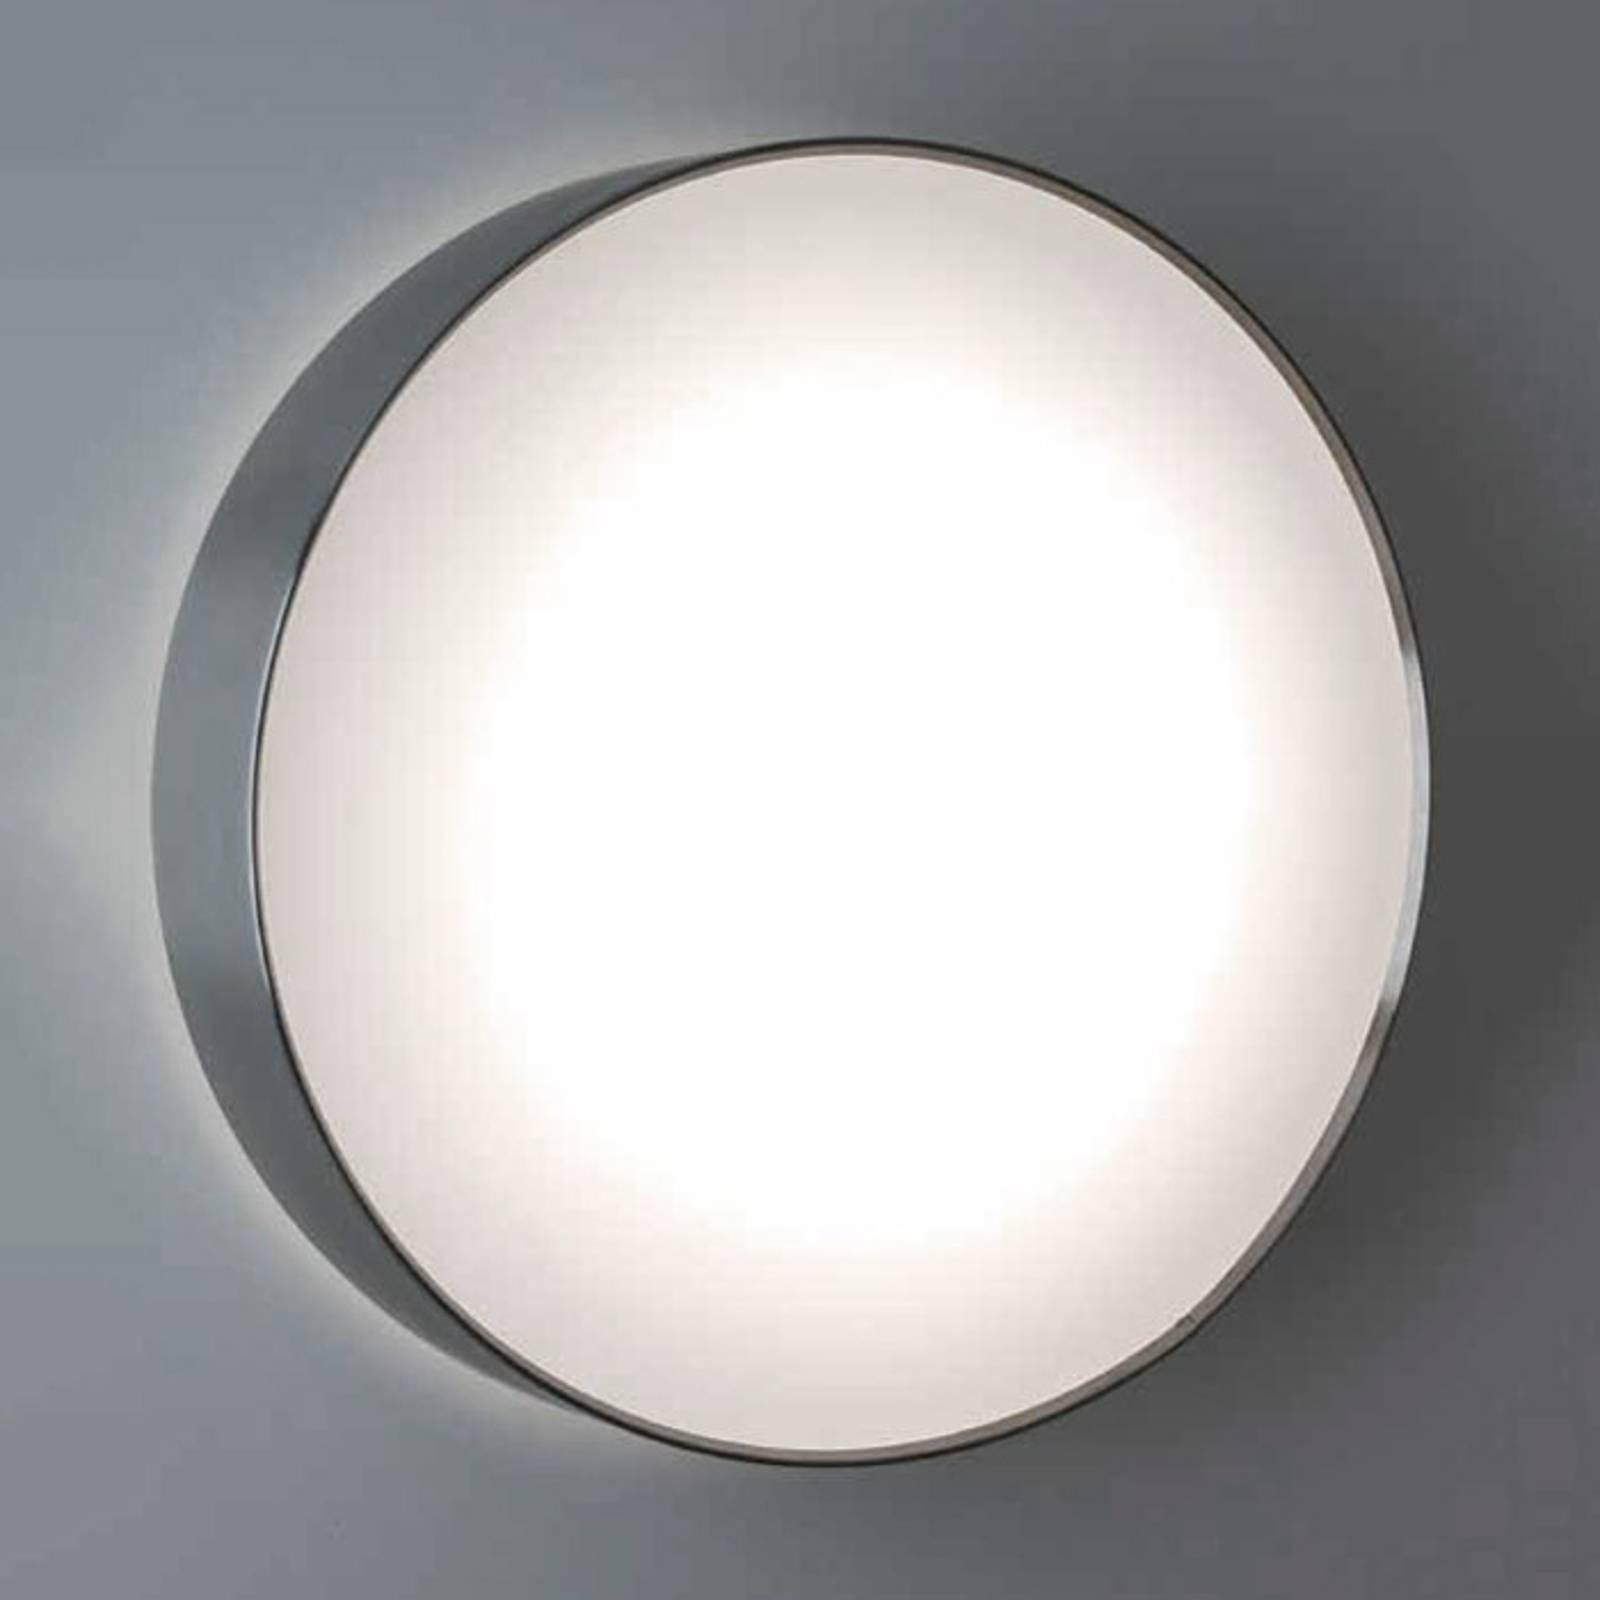 Roestvrij stalen wandlamp SUN 4 LED, 8 W 4 K